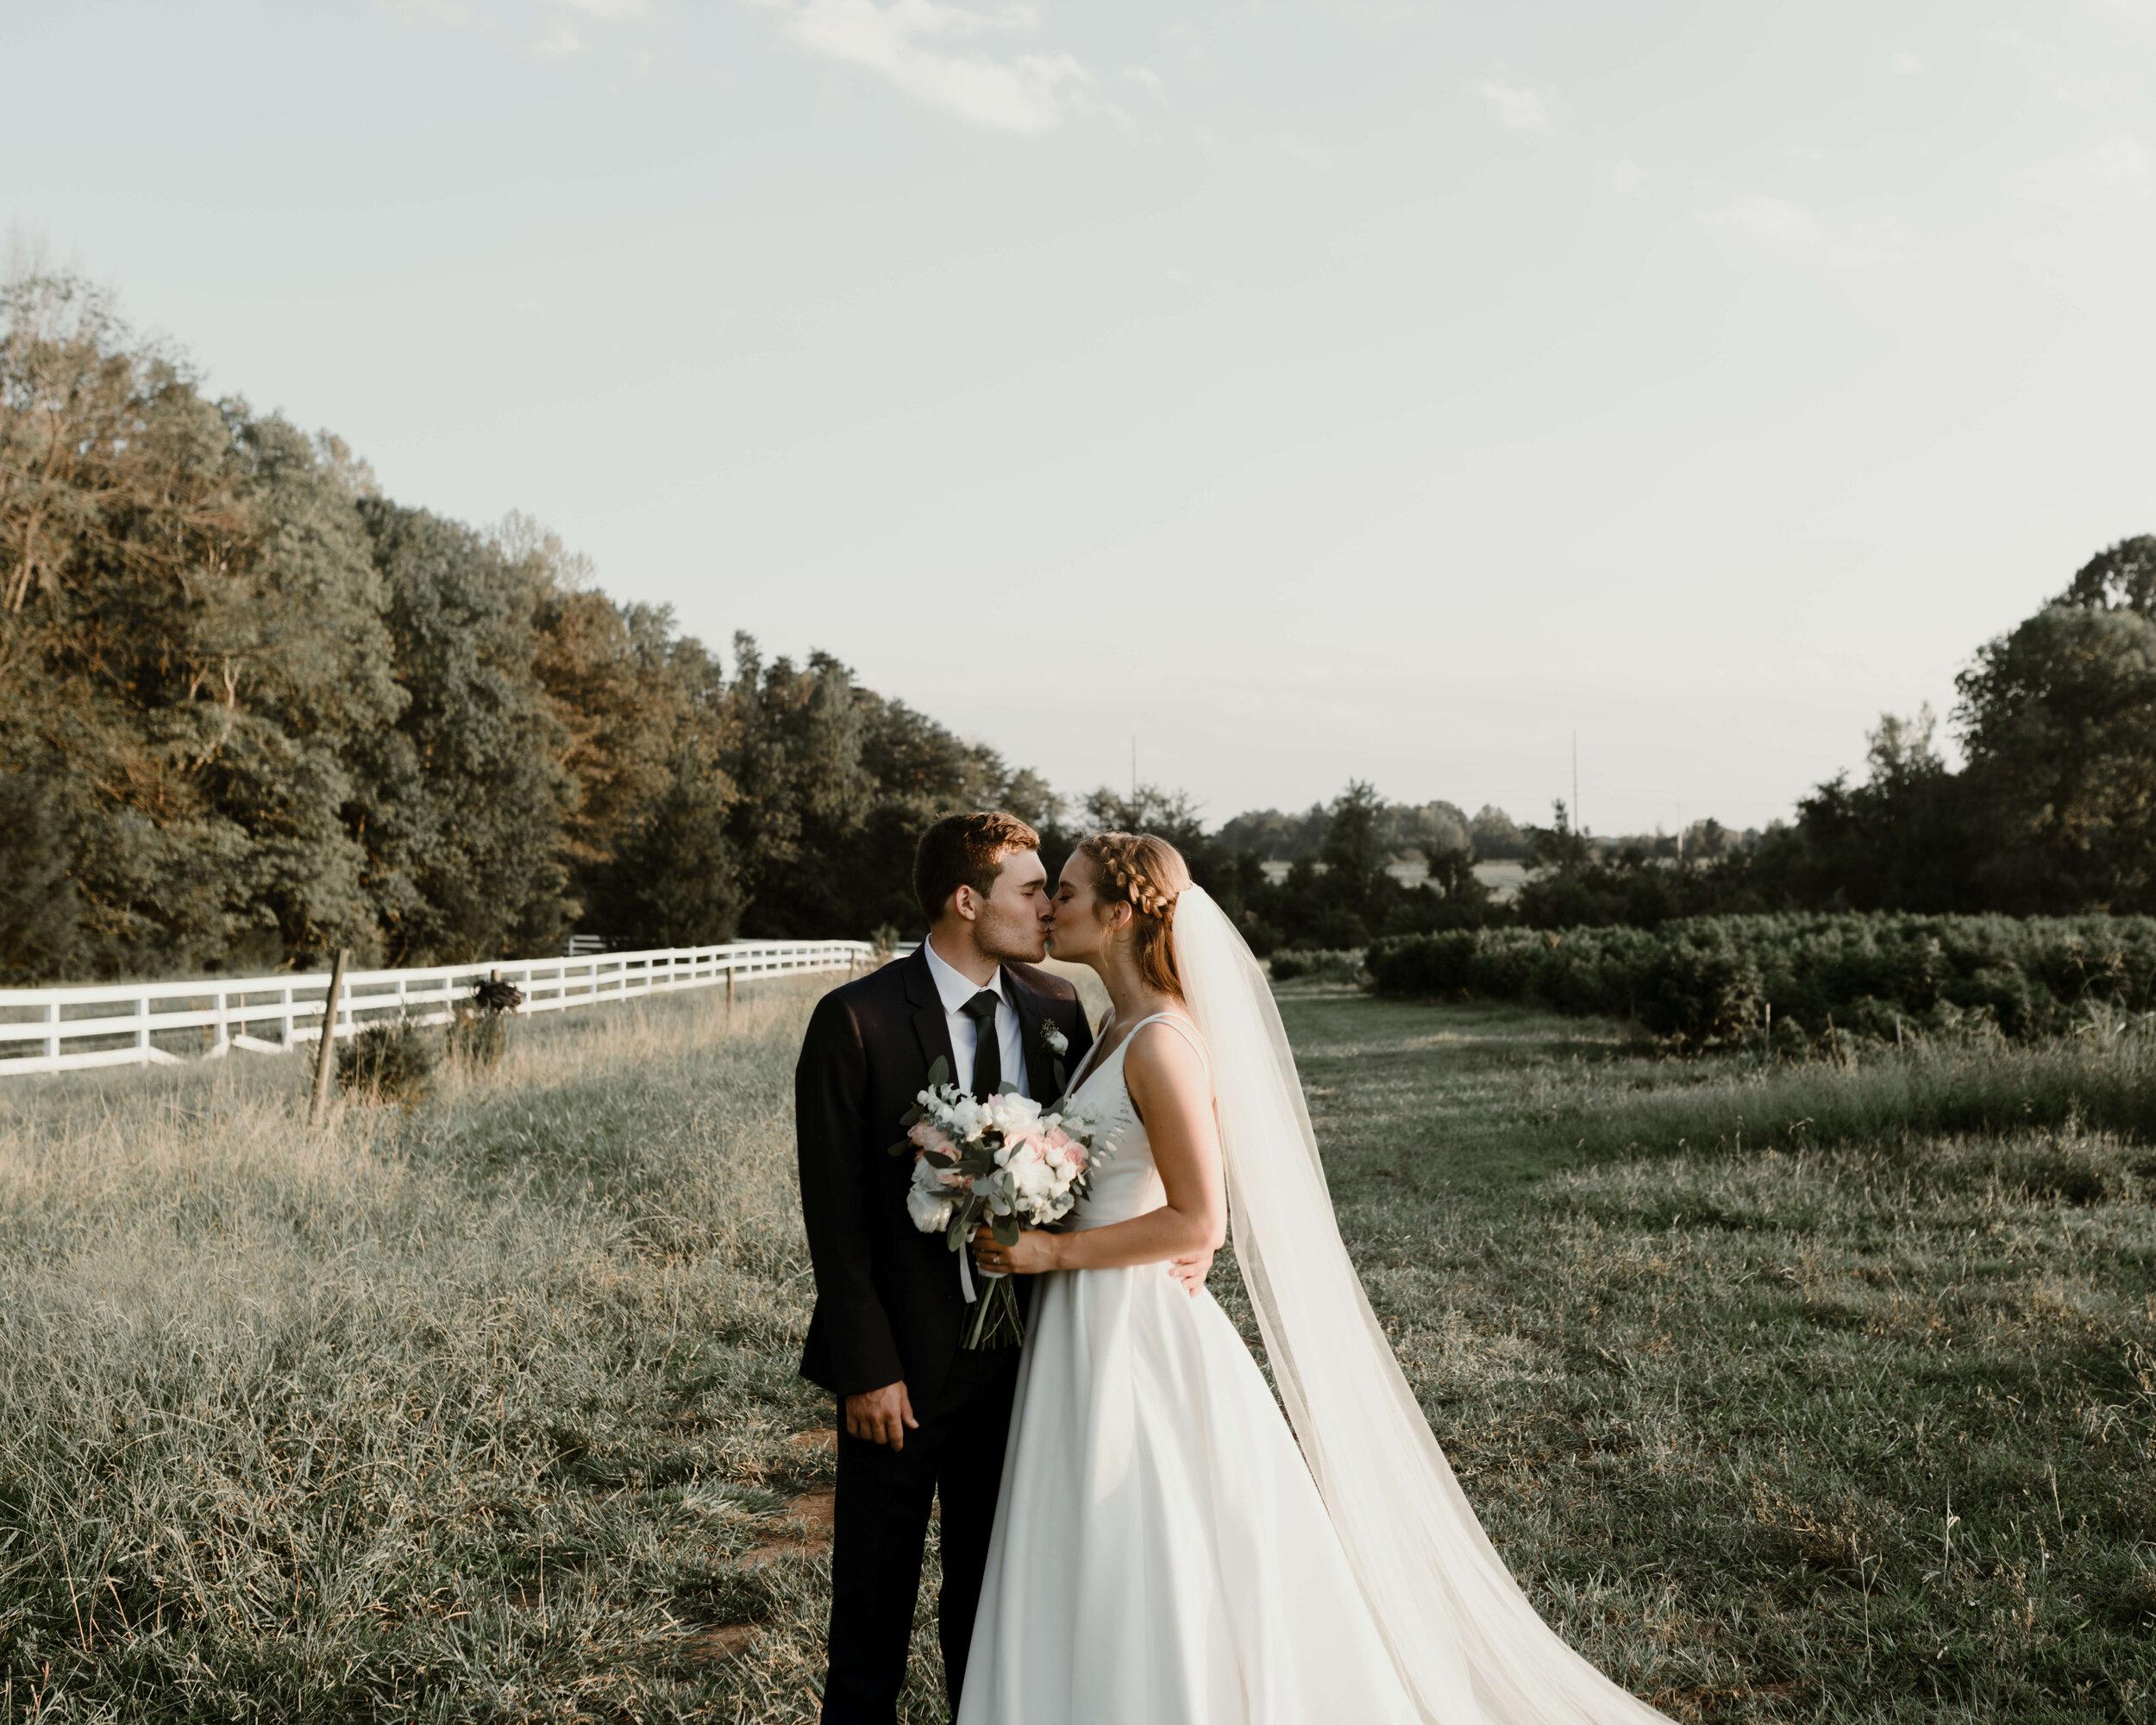 RALEIGH_WEDDING_GABBY_AND_SMITTYDSC_2336.jpg